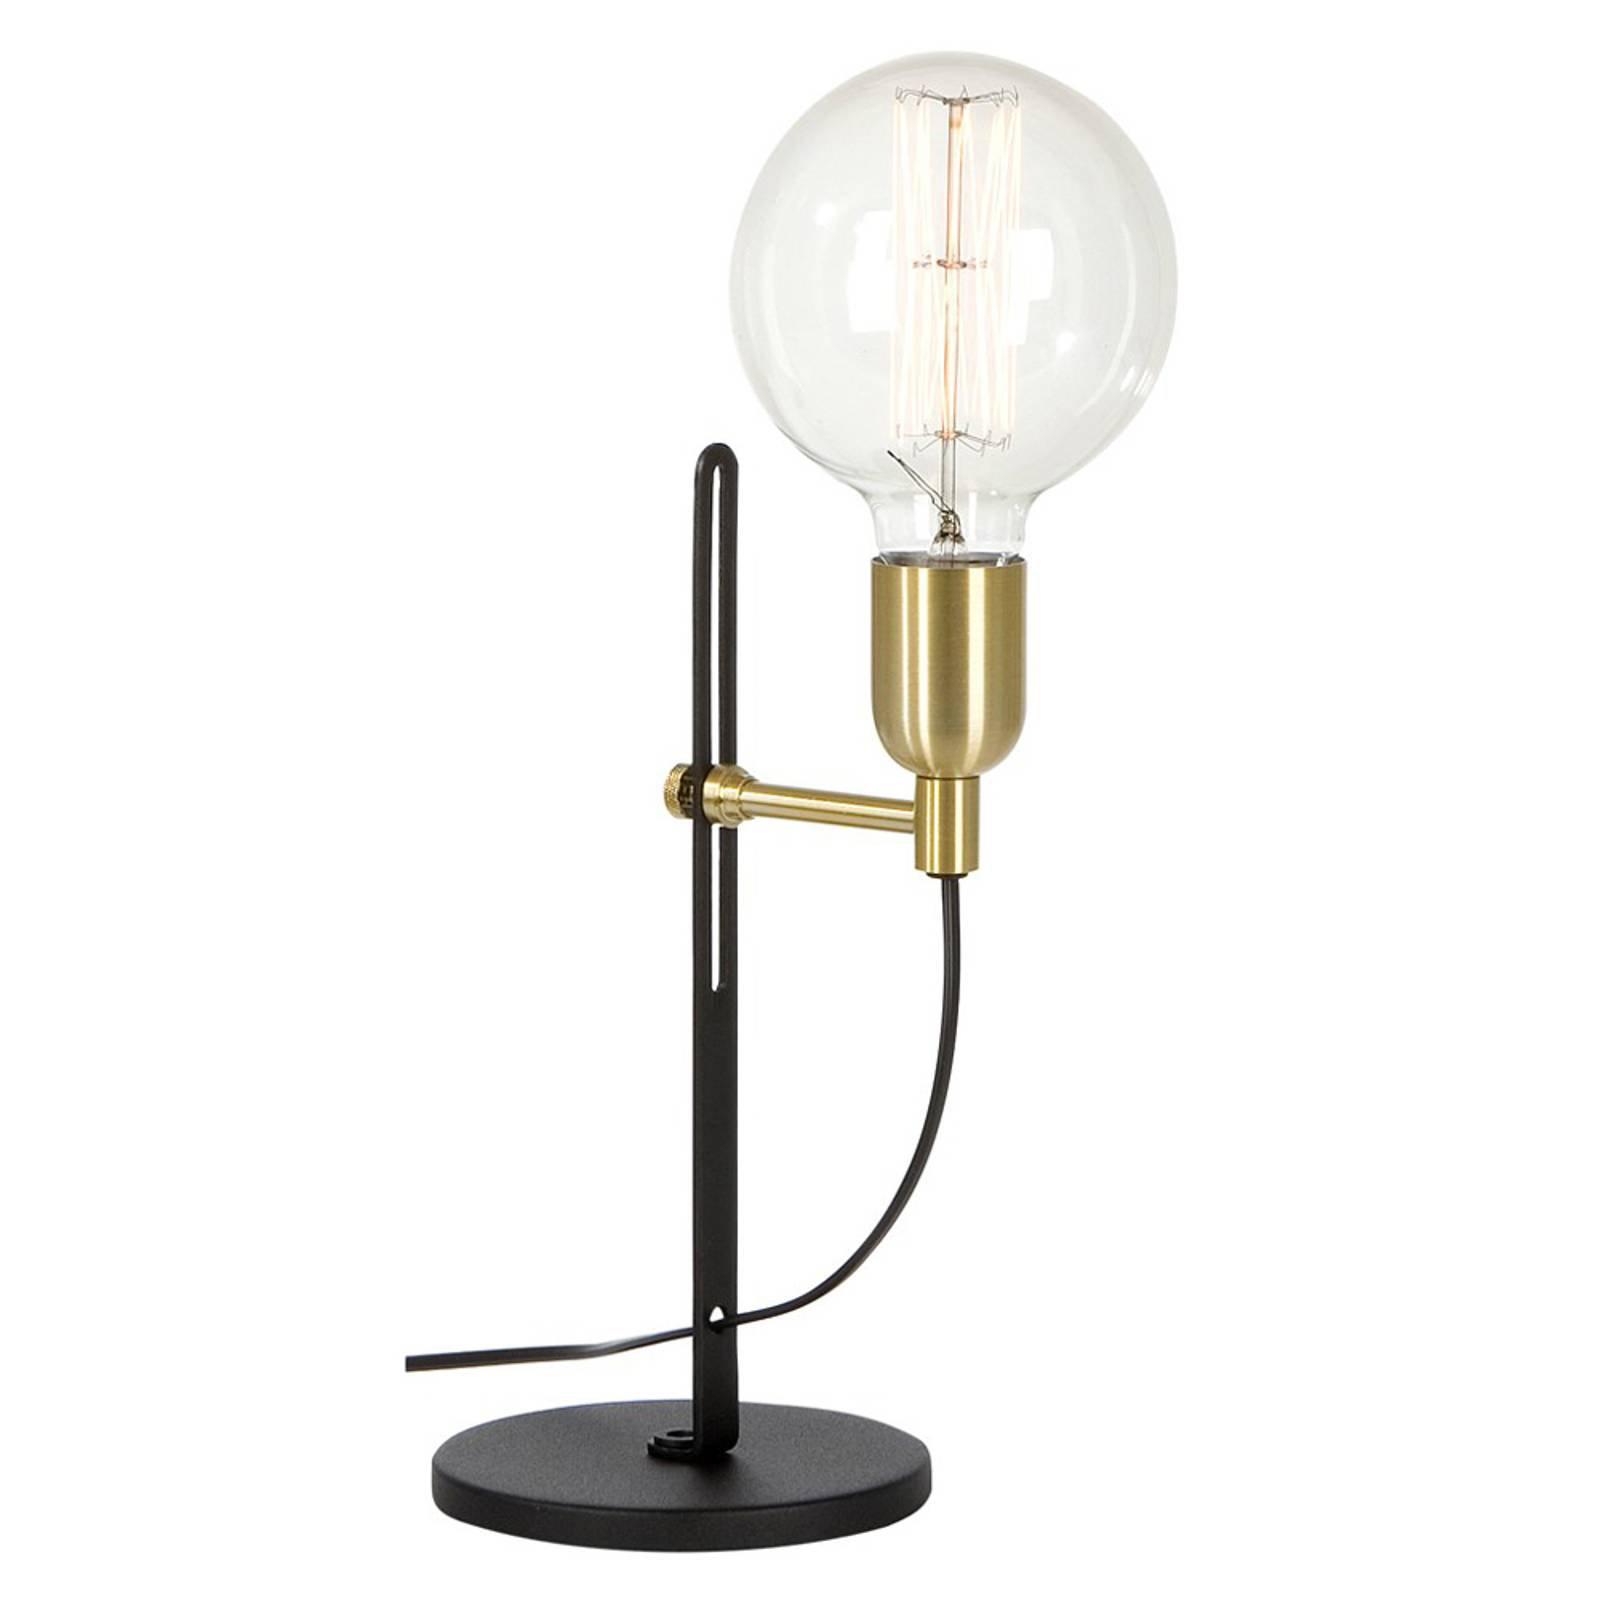 Bordlampe Regal svart messing, ett lys